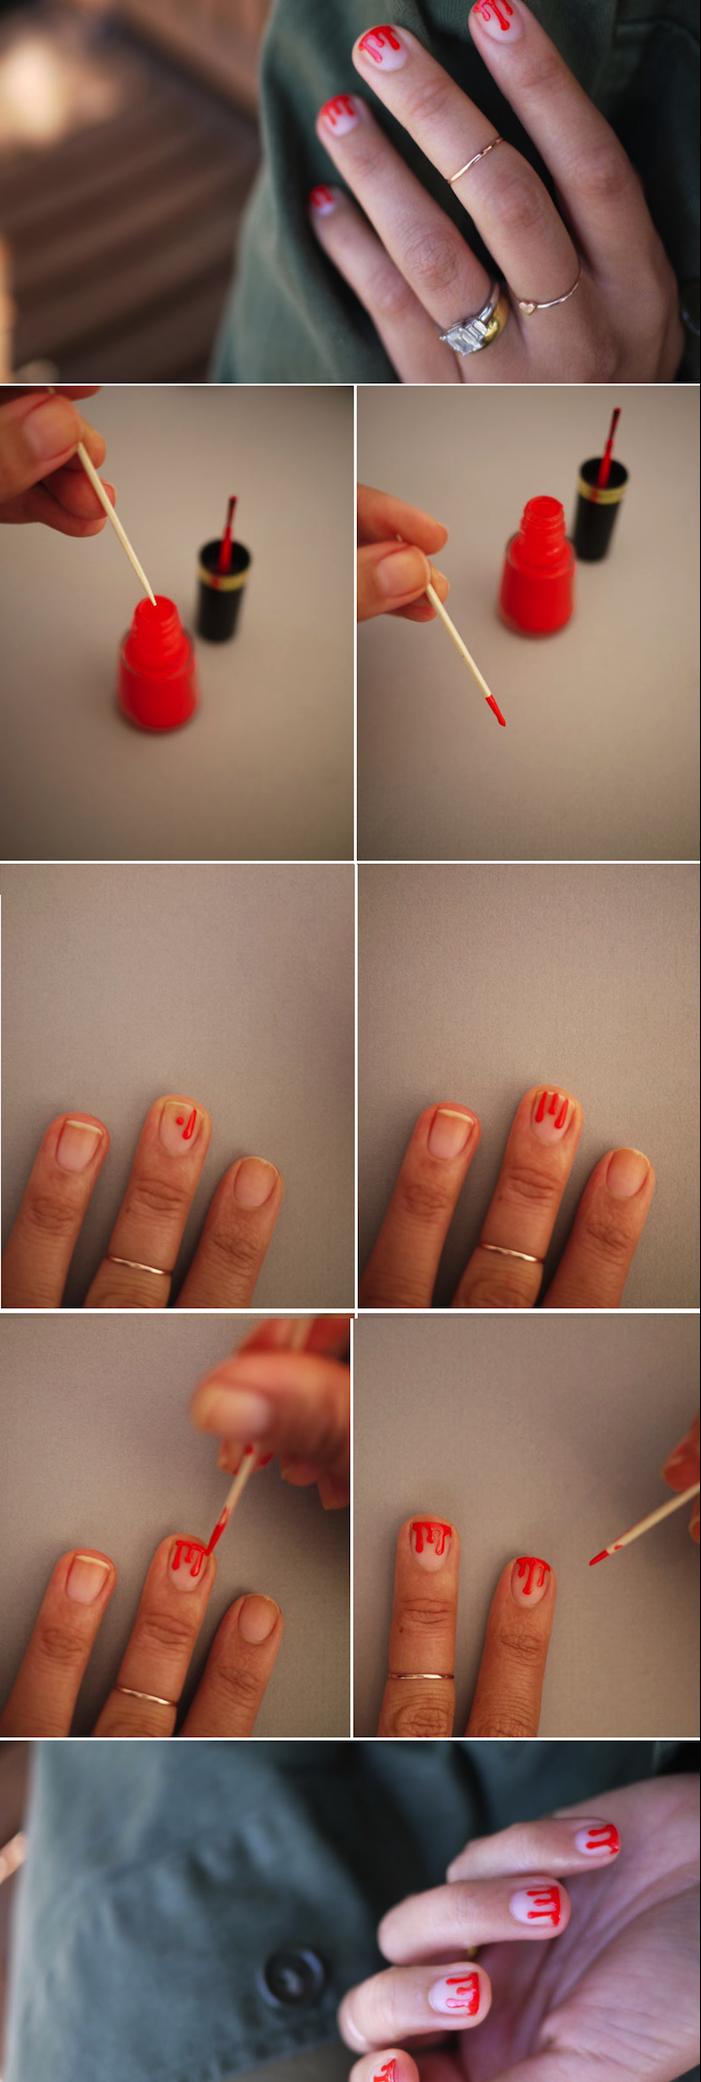 nailart bilder, roter nagellack, kurze nägel lackieren, diy